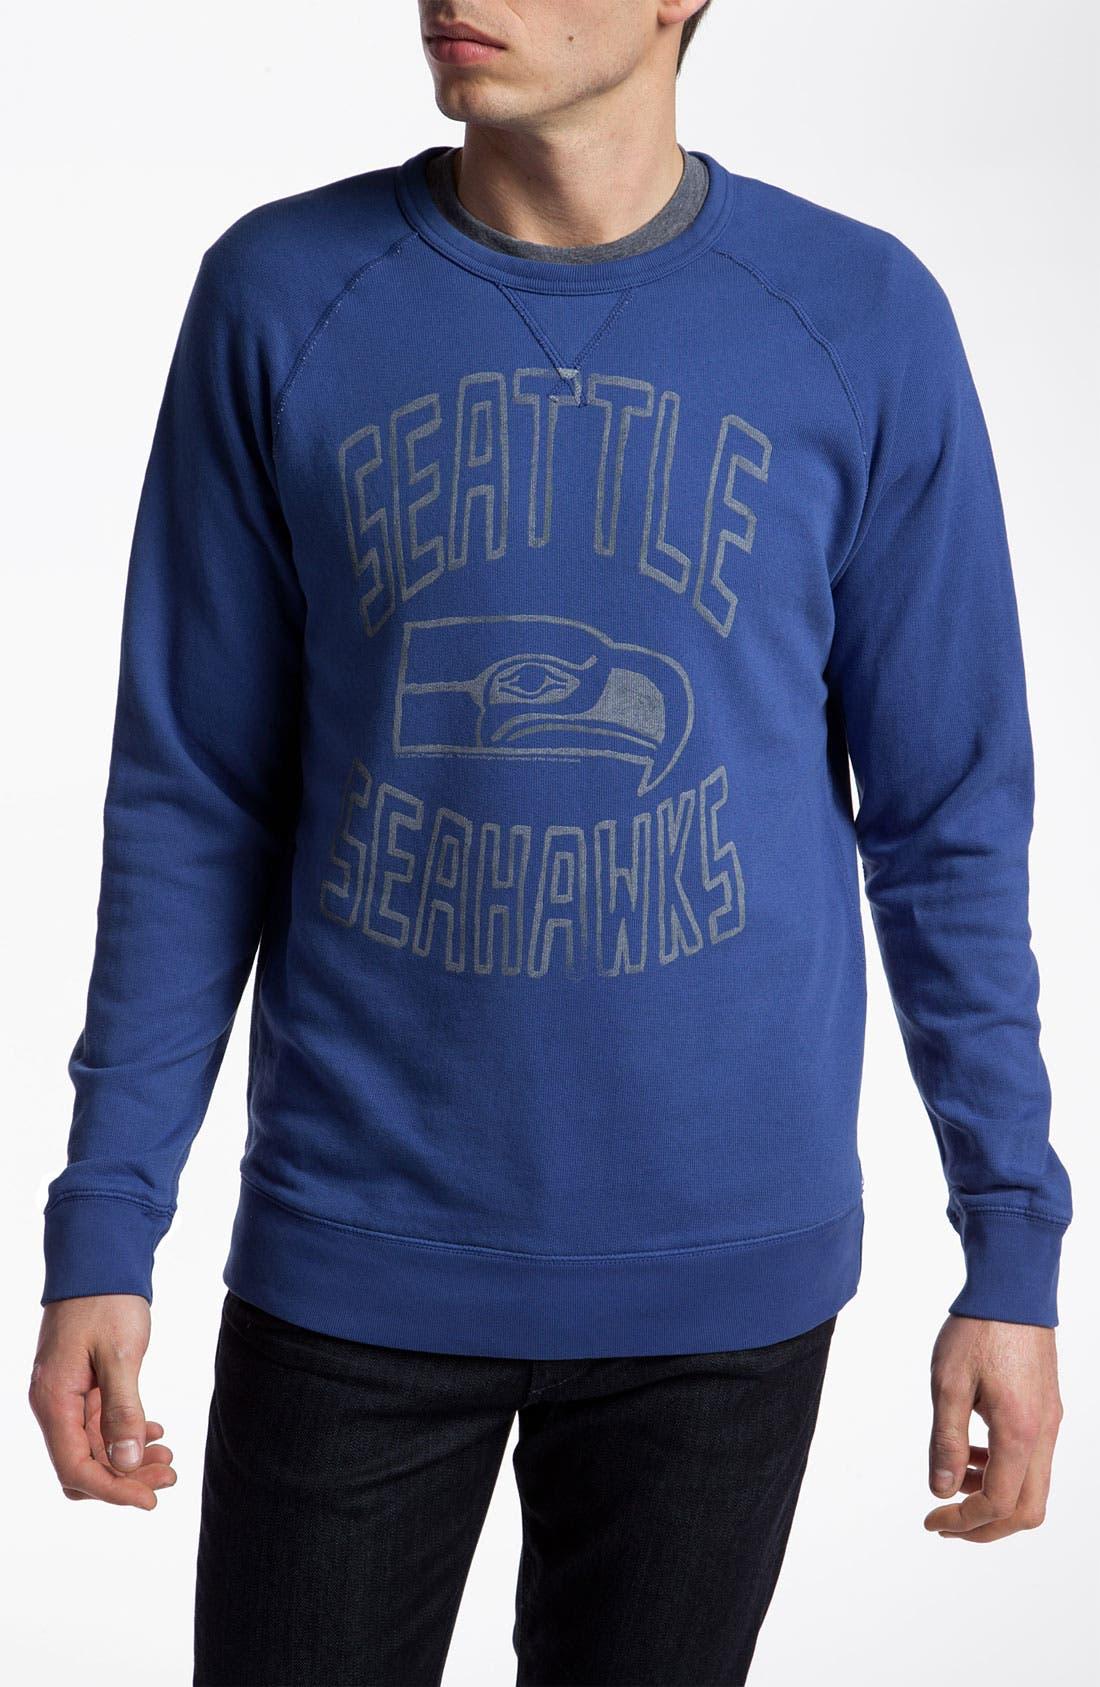 Alternate Image 1 Selected - Junk Food 'Seattle Seahawks' Sweatshirt